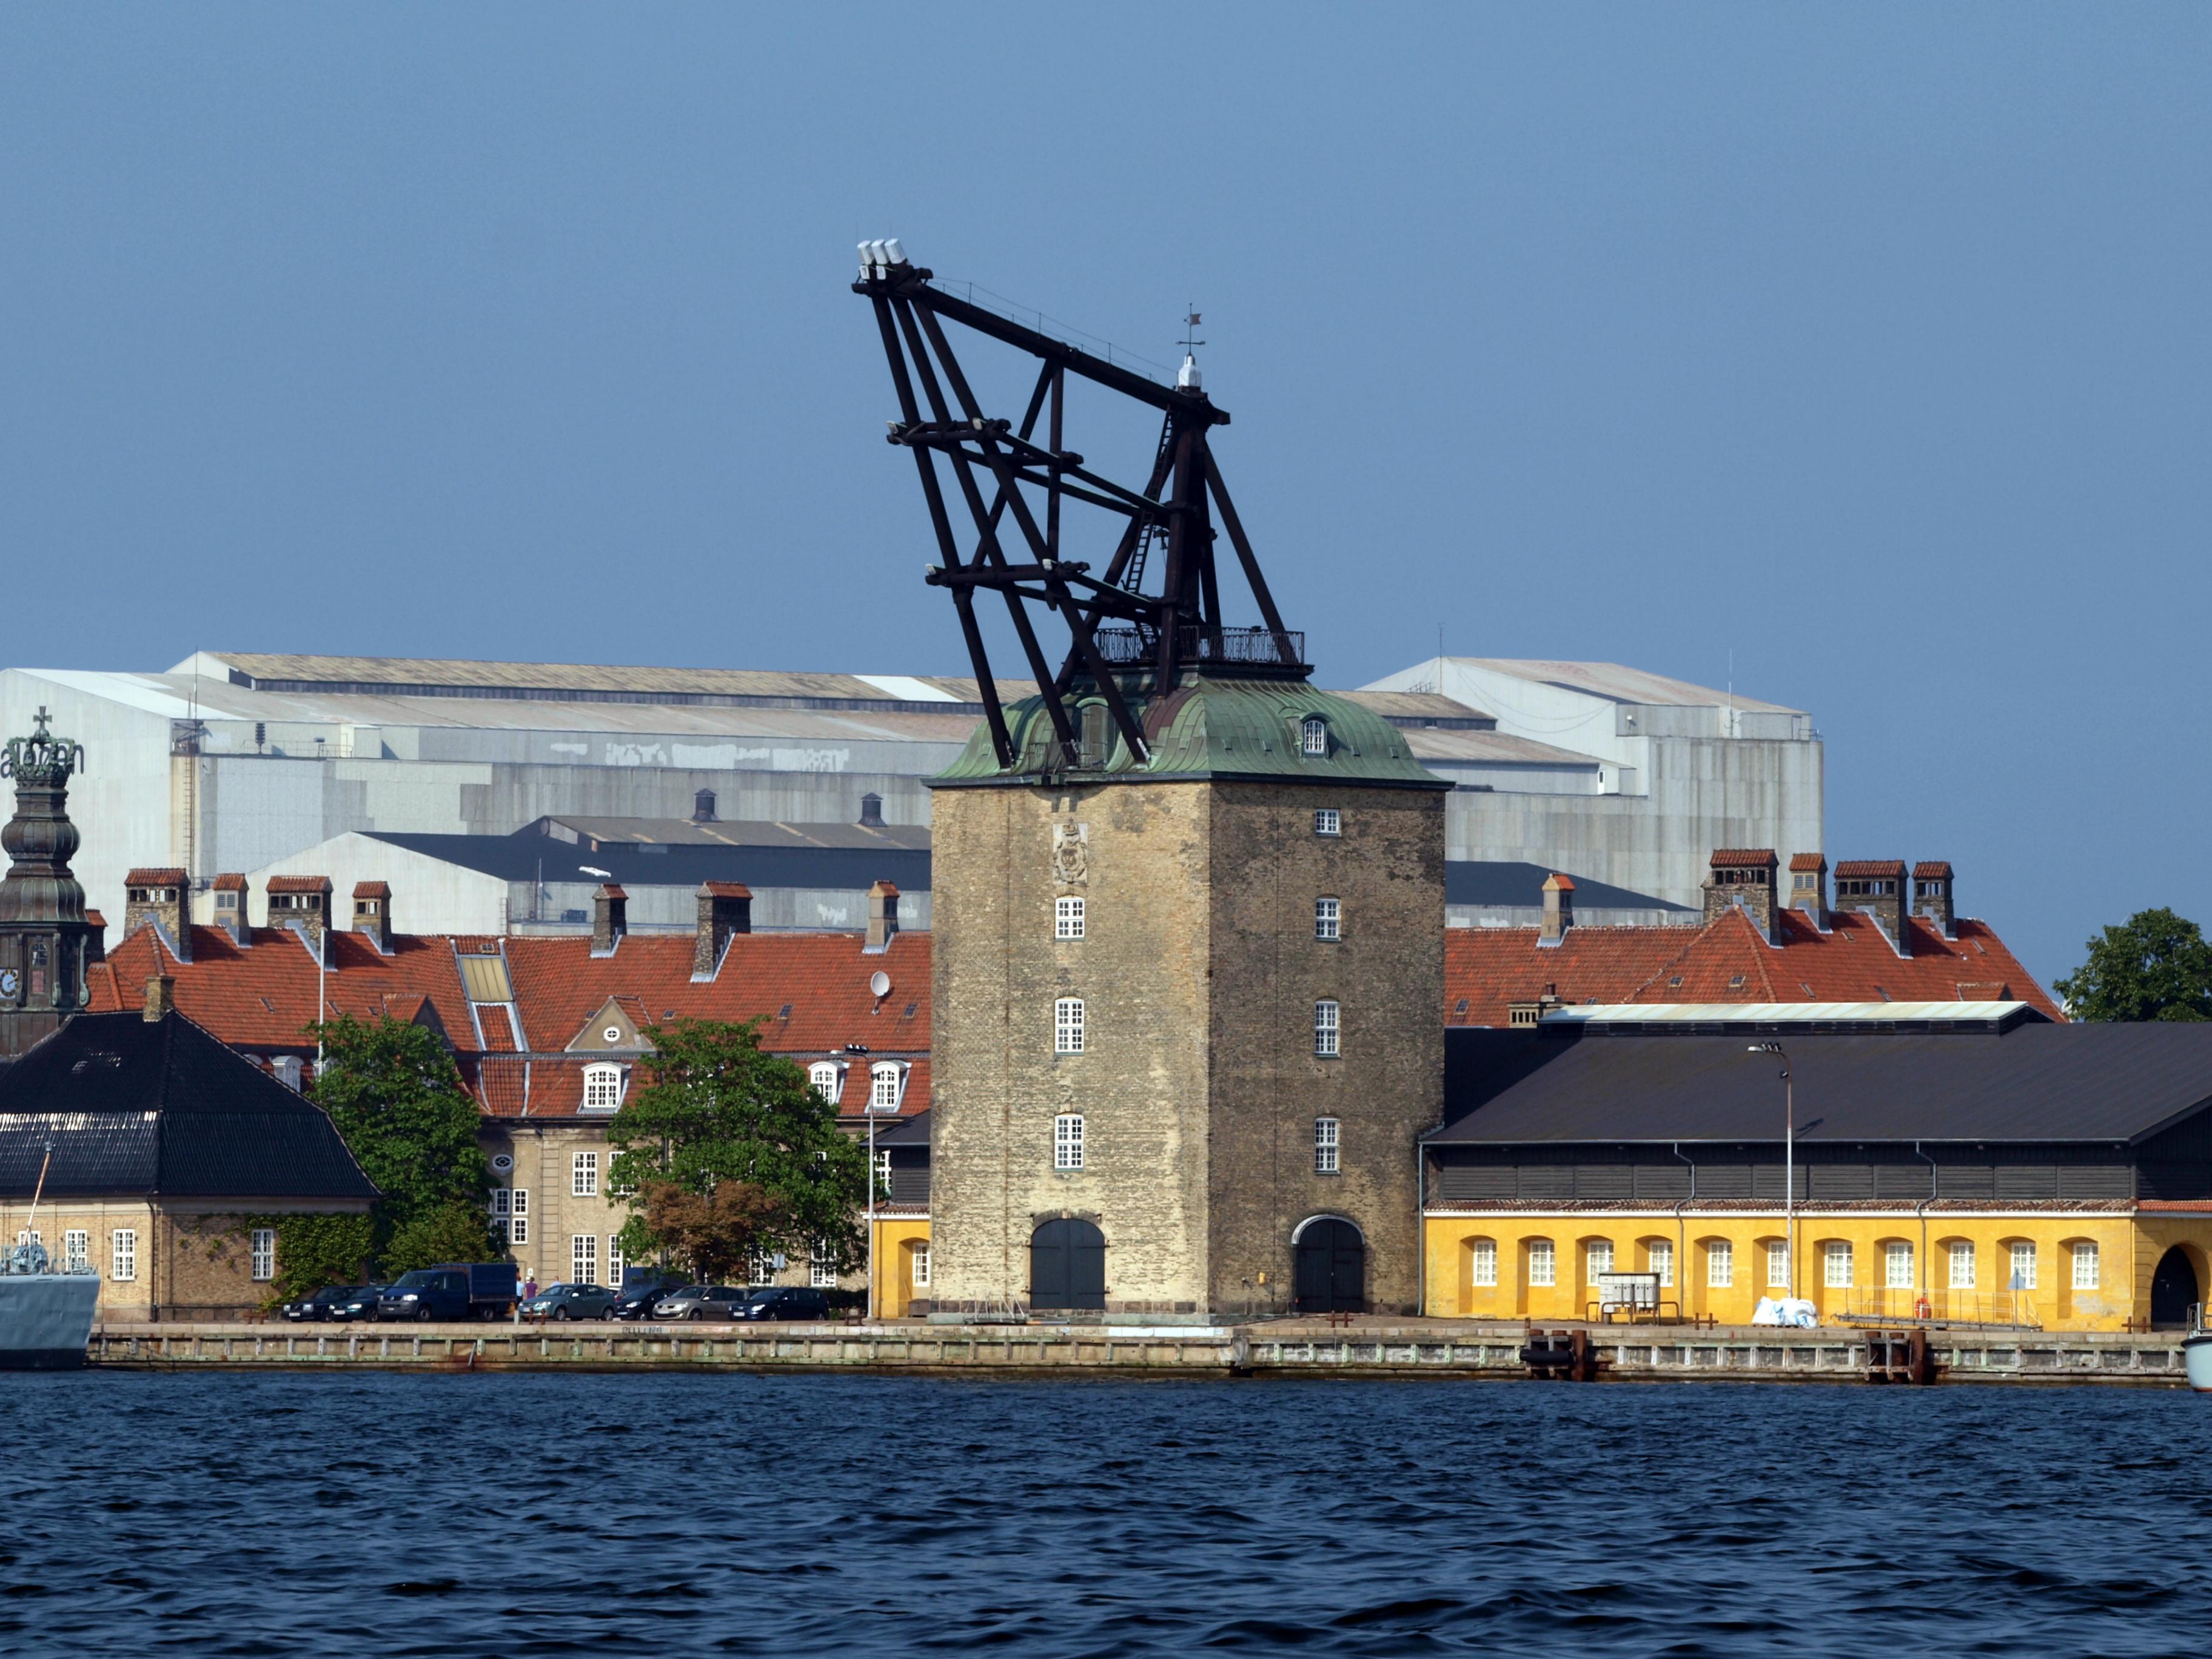 1742 build crane, used for mounting masts to large sailing vessels. copenhagen, denmark, mastekranen, holmen. copenhagen, denmark.jpg